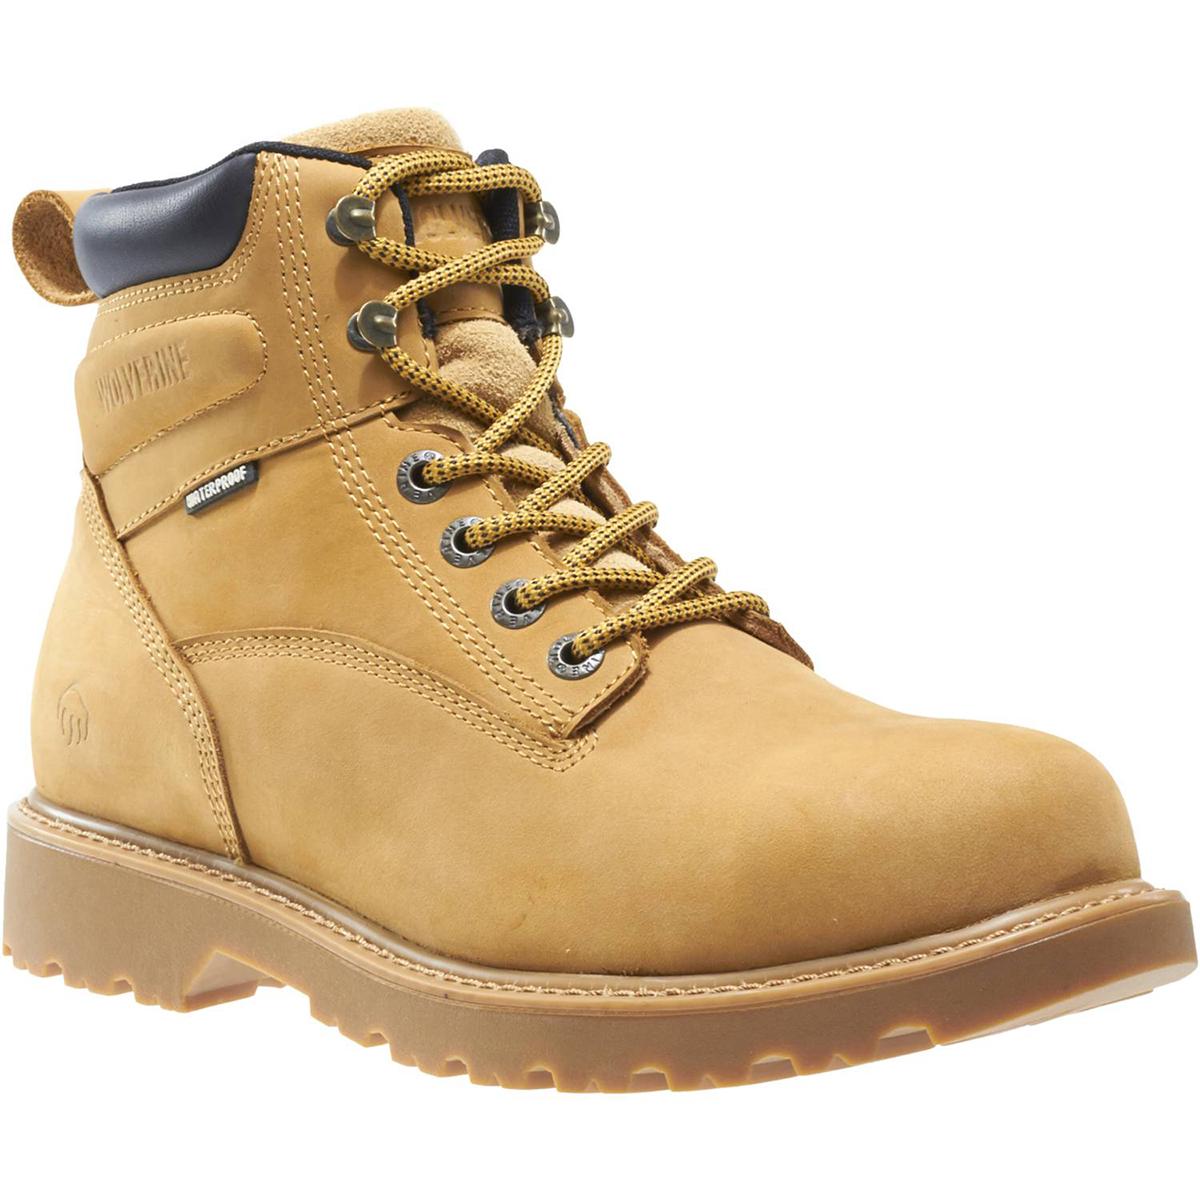 Wolverine Men's Floorhand Wp 6 In. Soft Toe Work Boots - Brown, 13